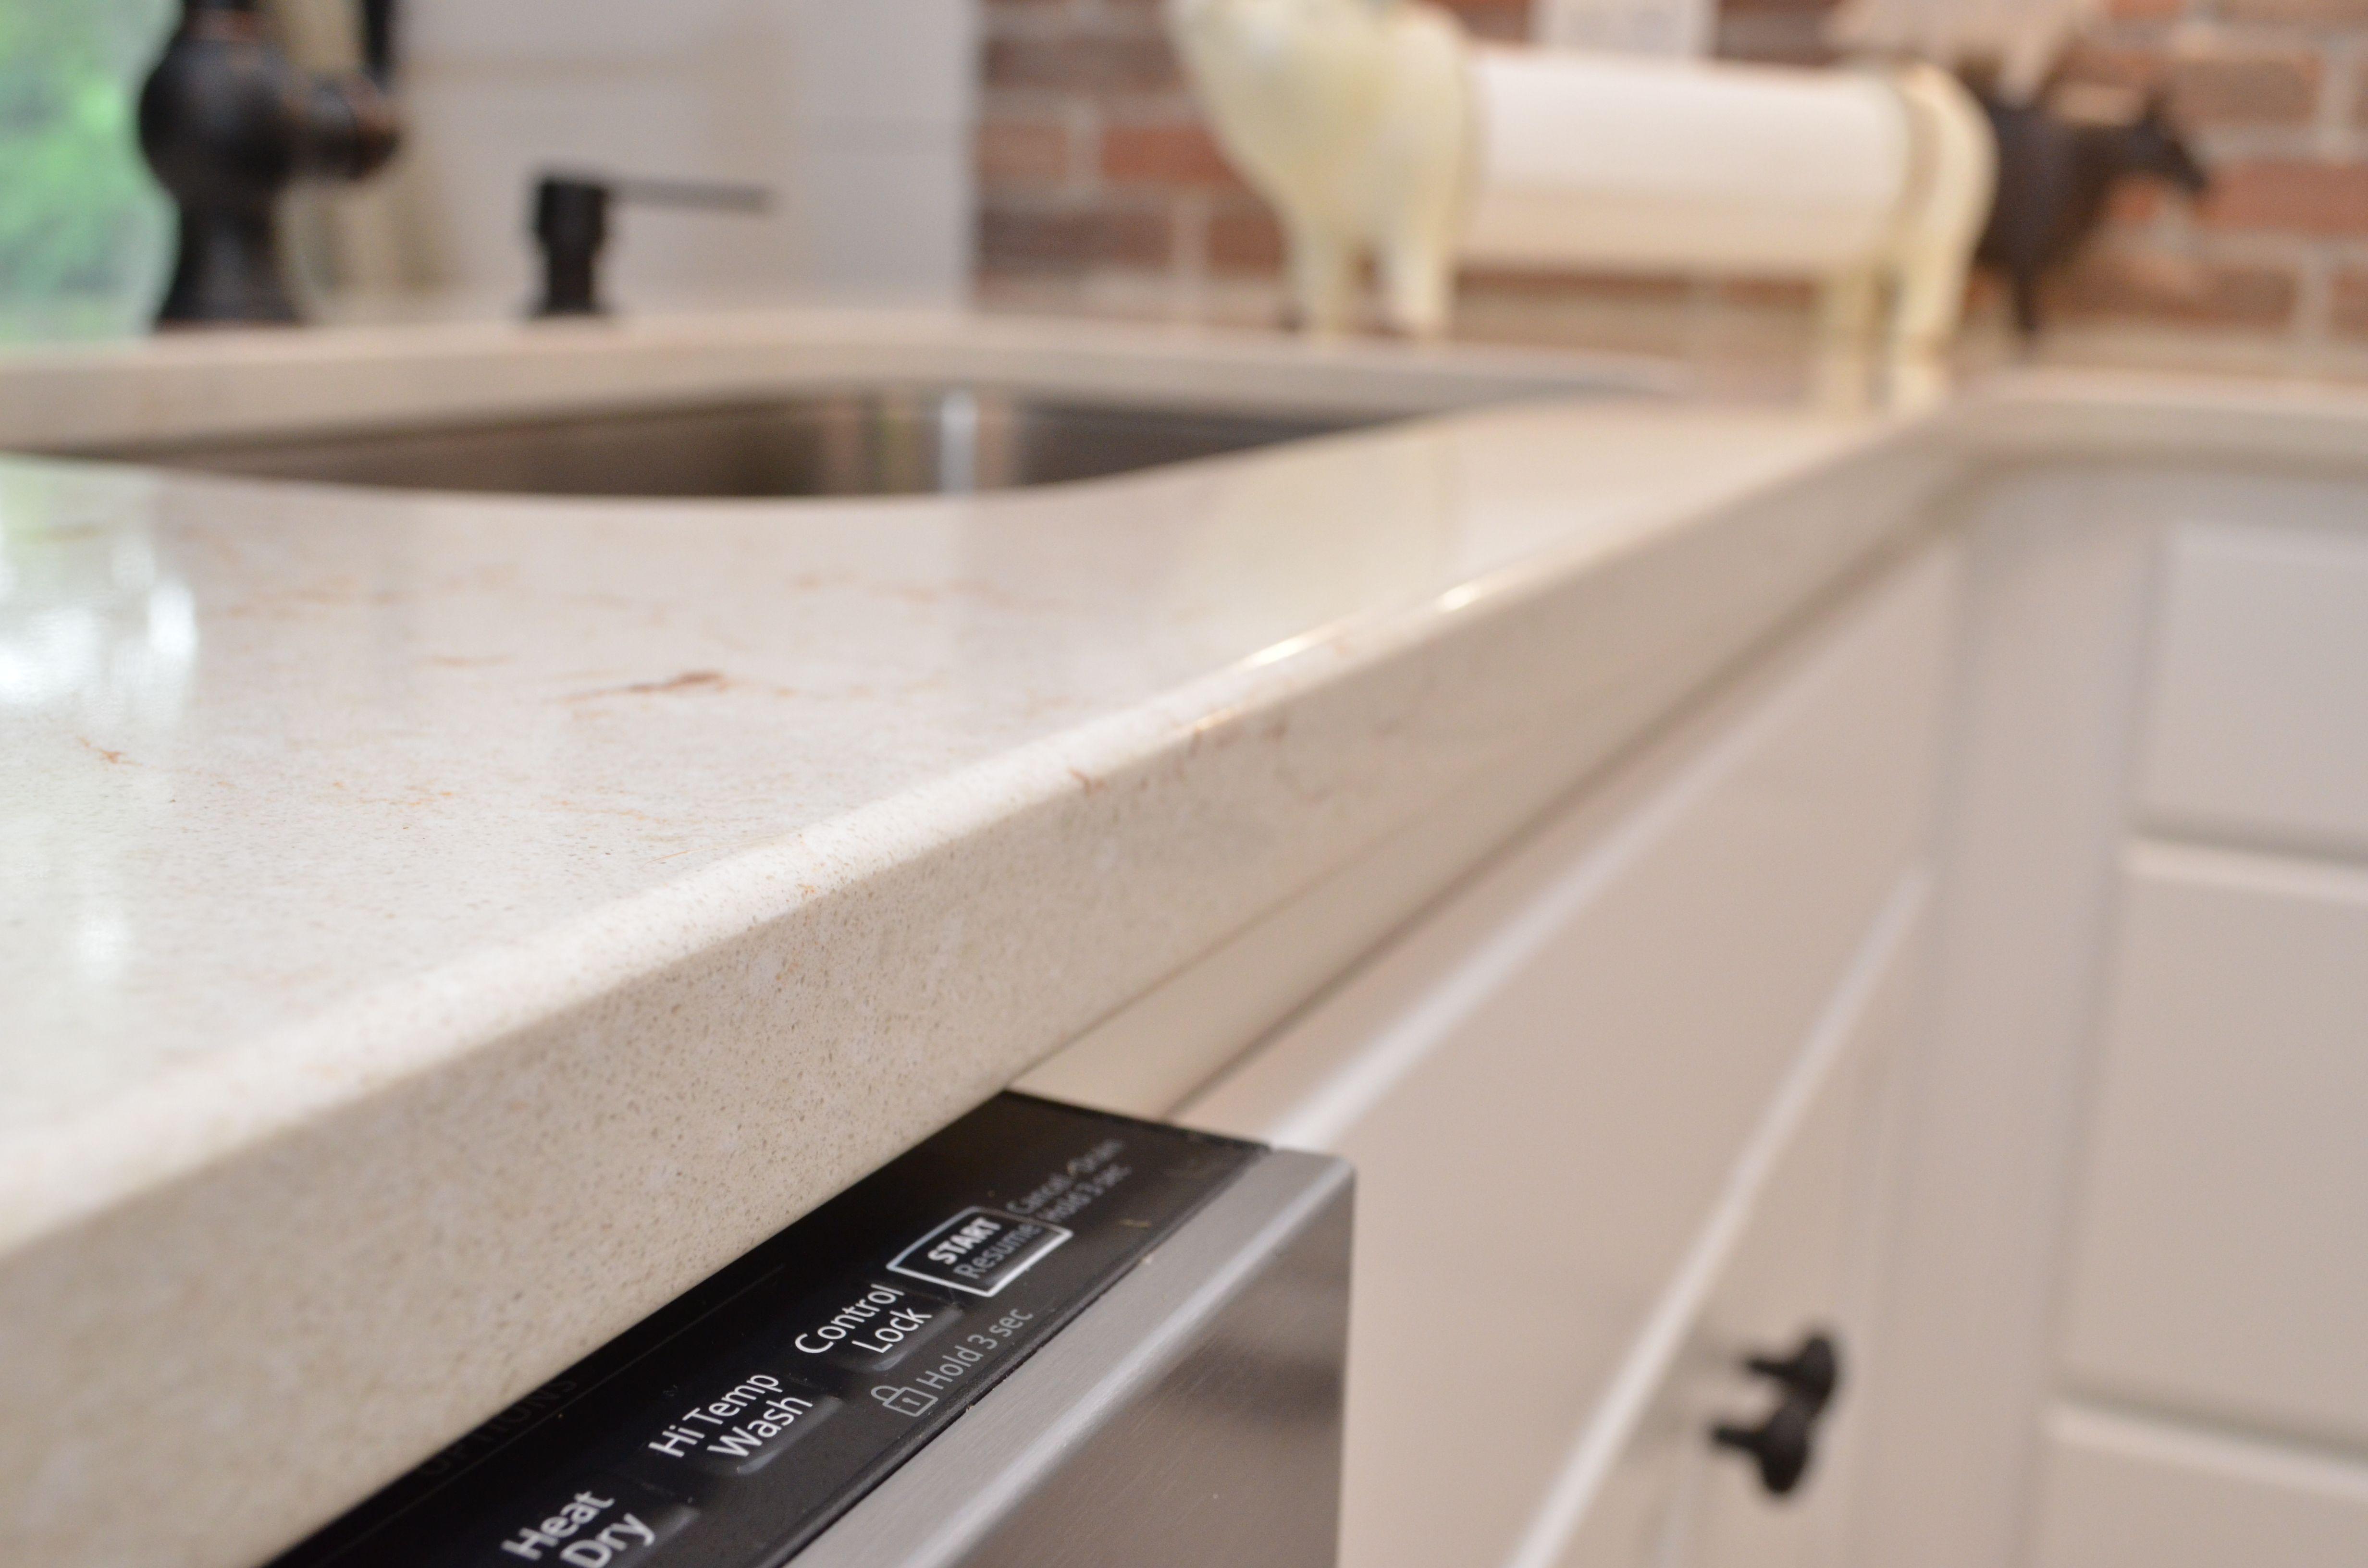 Hanstone Quartz Countertop Eased Edge Style Serenity Color Quartz Countertops Countertops Serenity Color